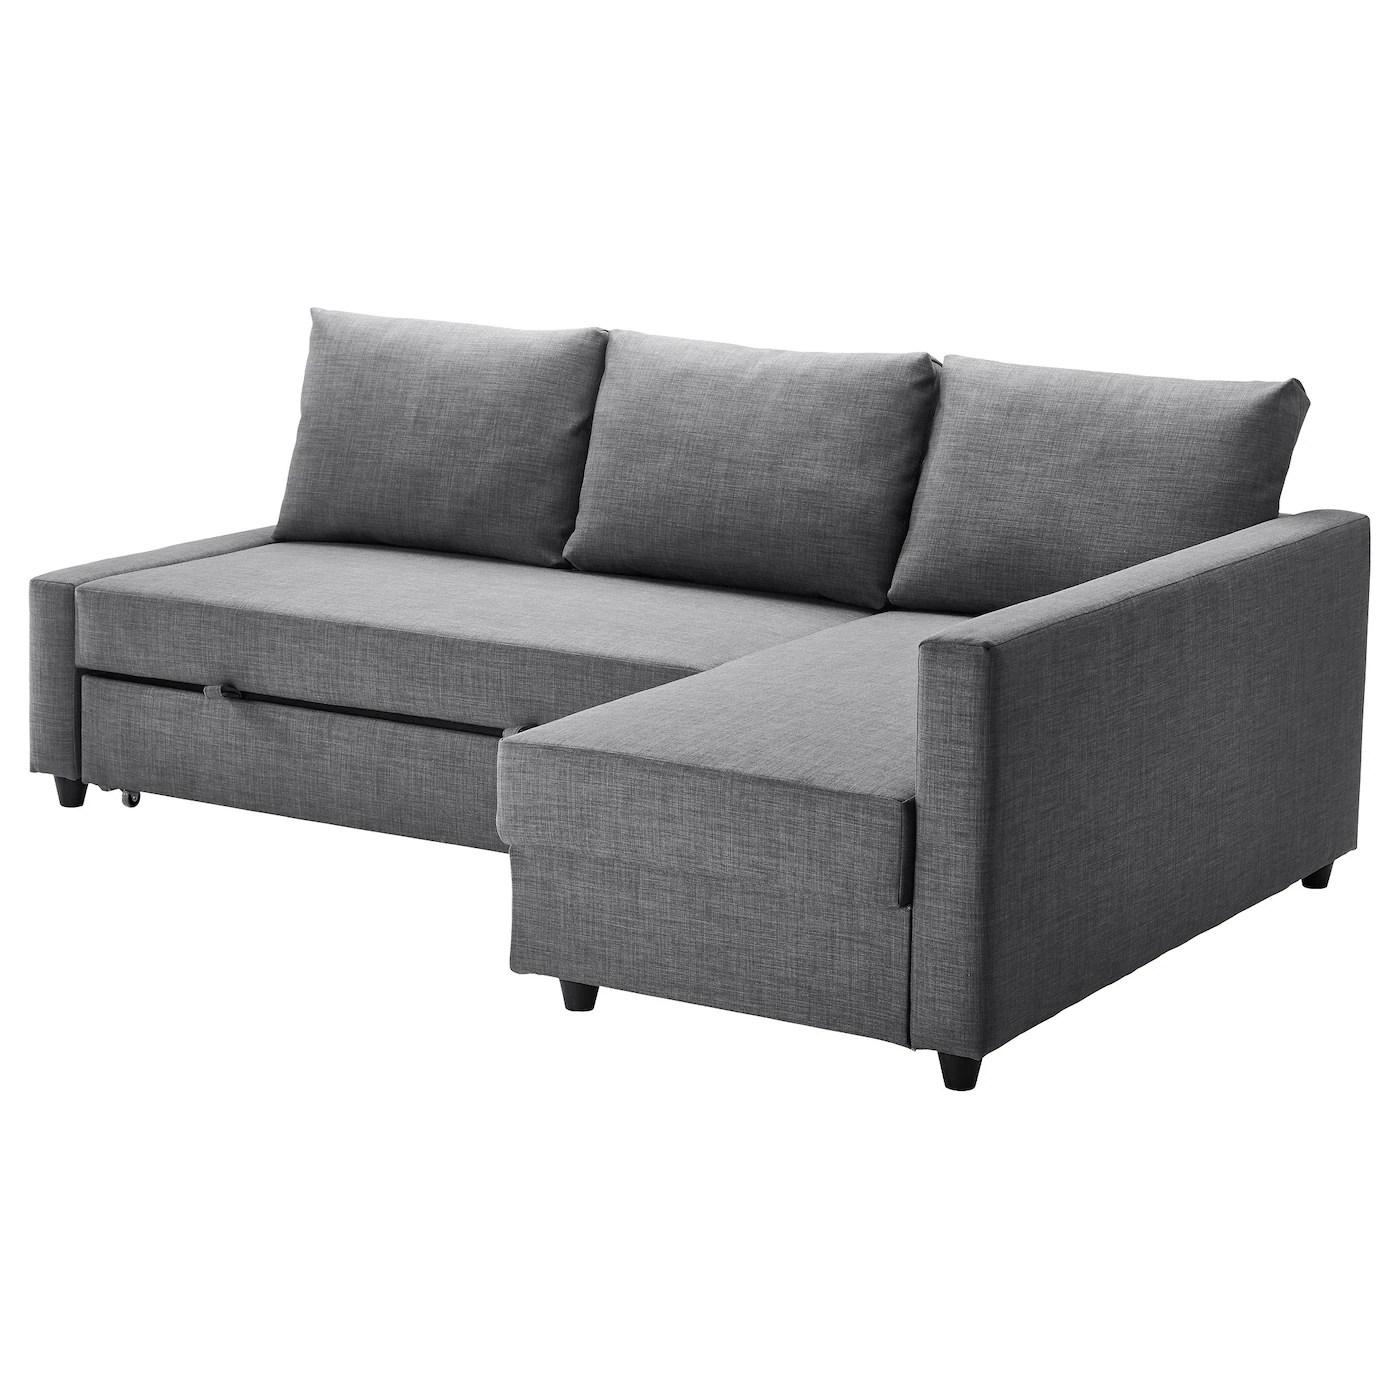 corner sofa bed skiftebo dark grey sacramento ca friheten with storage